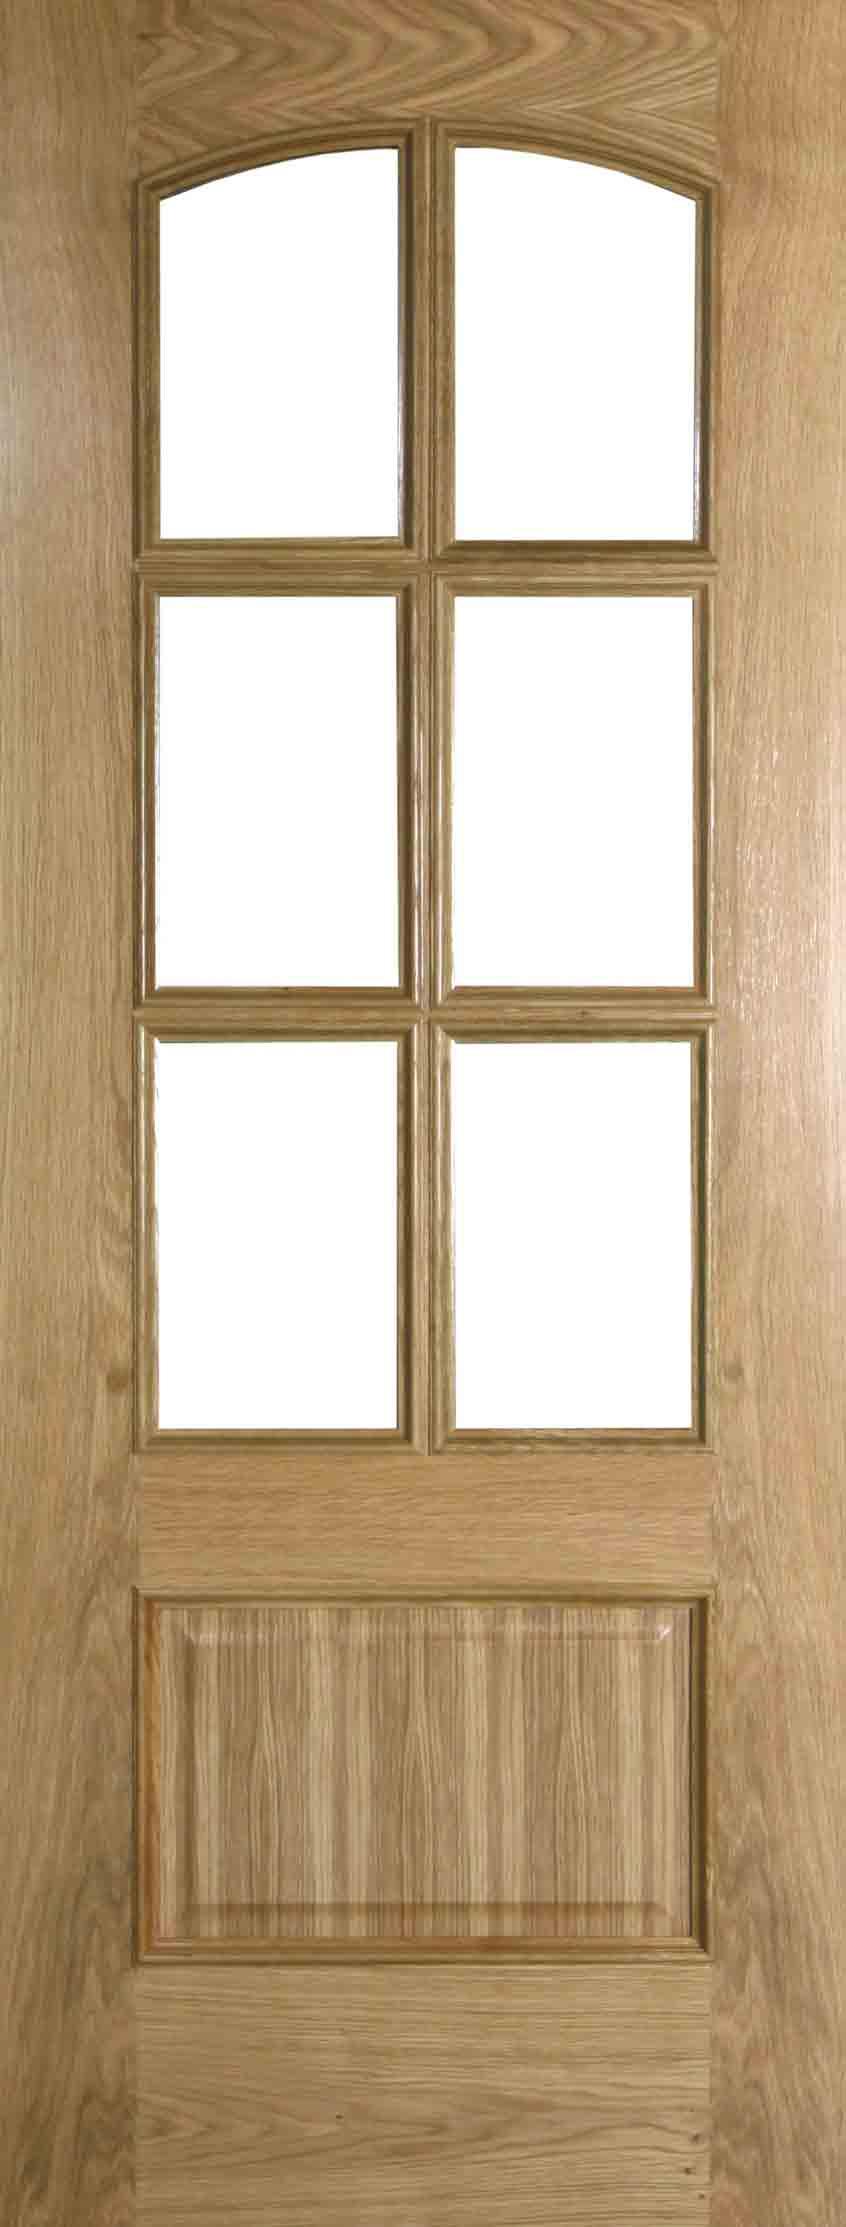 internal oak lanzarote door prefinished with clear flat. Black Bedroom Furniture Sets. Home Design Ideas